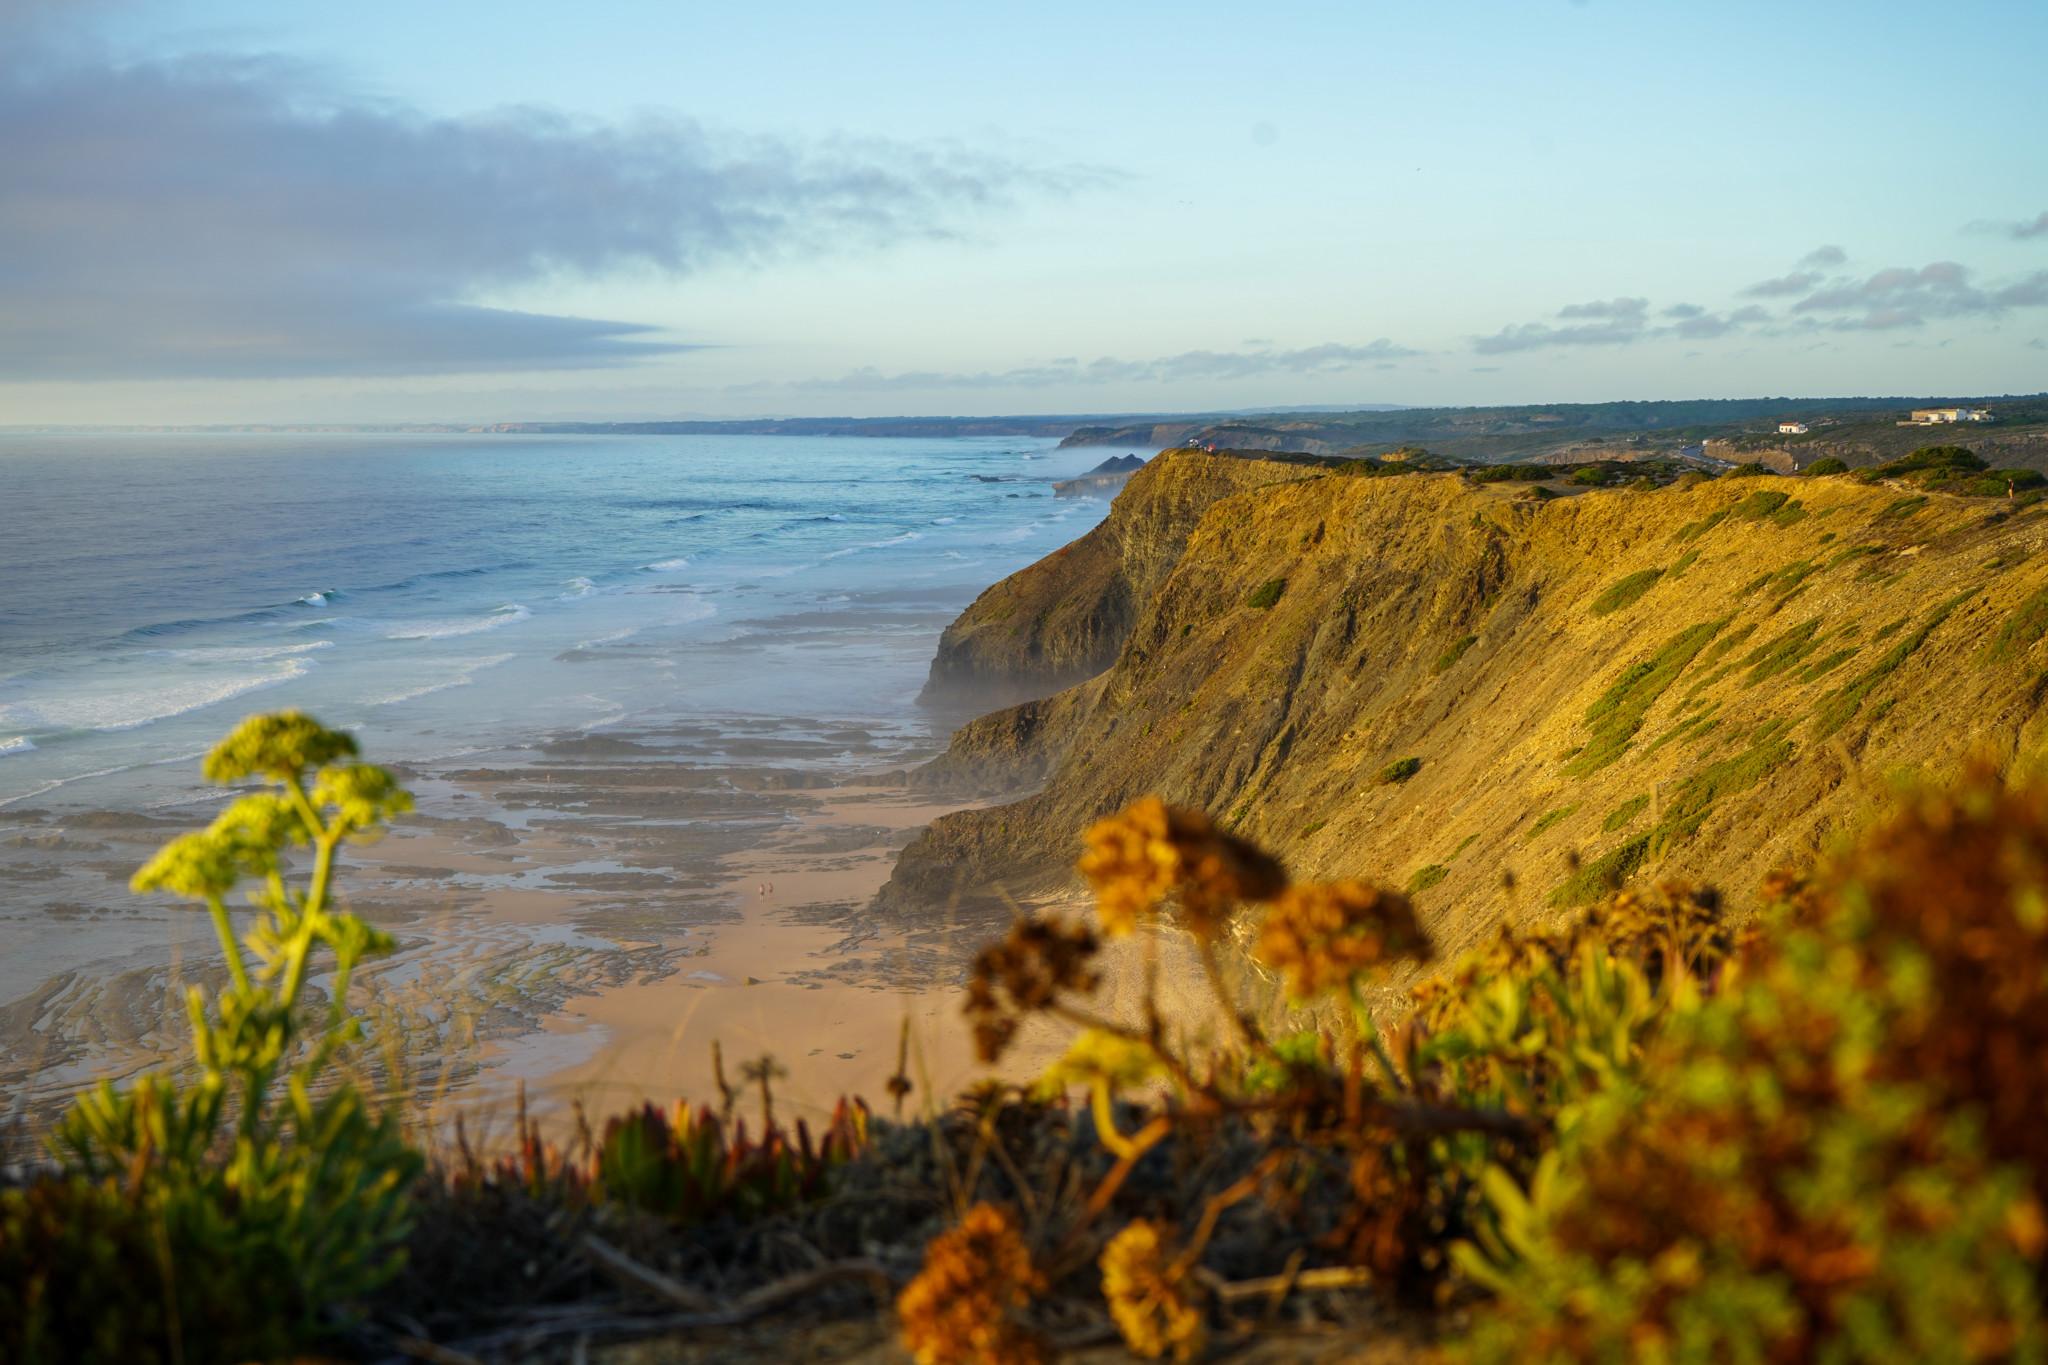 Reiseziele in Europa, wie die Algarve in Portugal